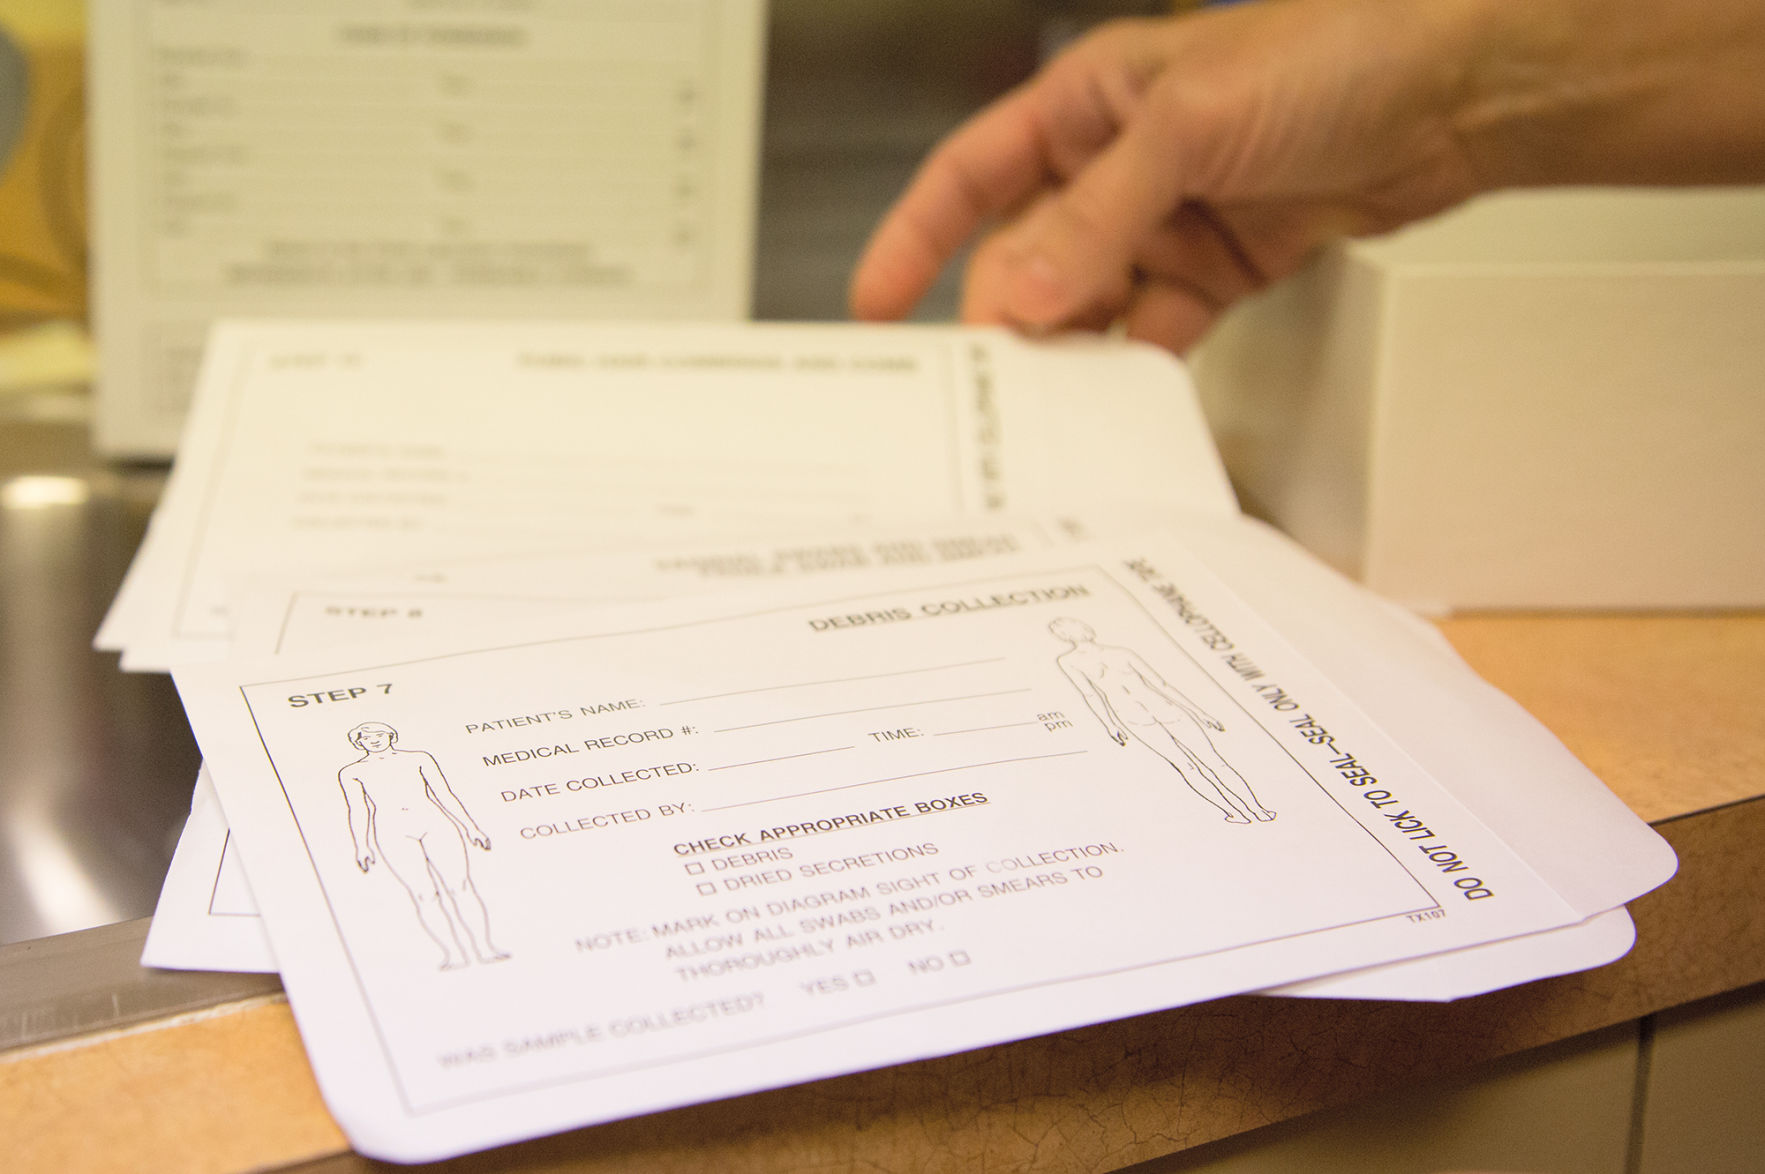 nurse sample resume%0A new graduate nurse resume examples new grad nurse cover letter sample  Transport Nurse Cover Letter Dinner